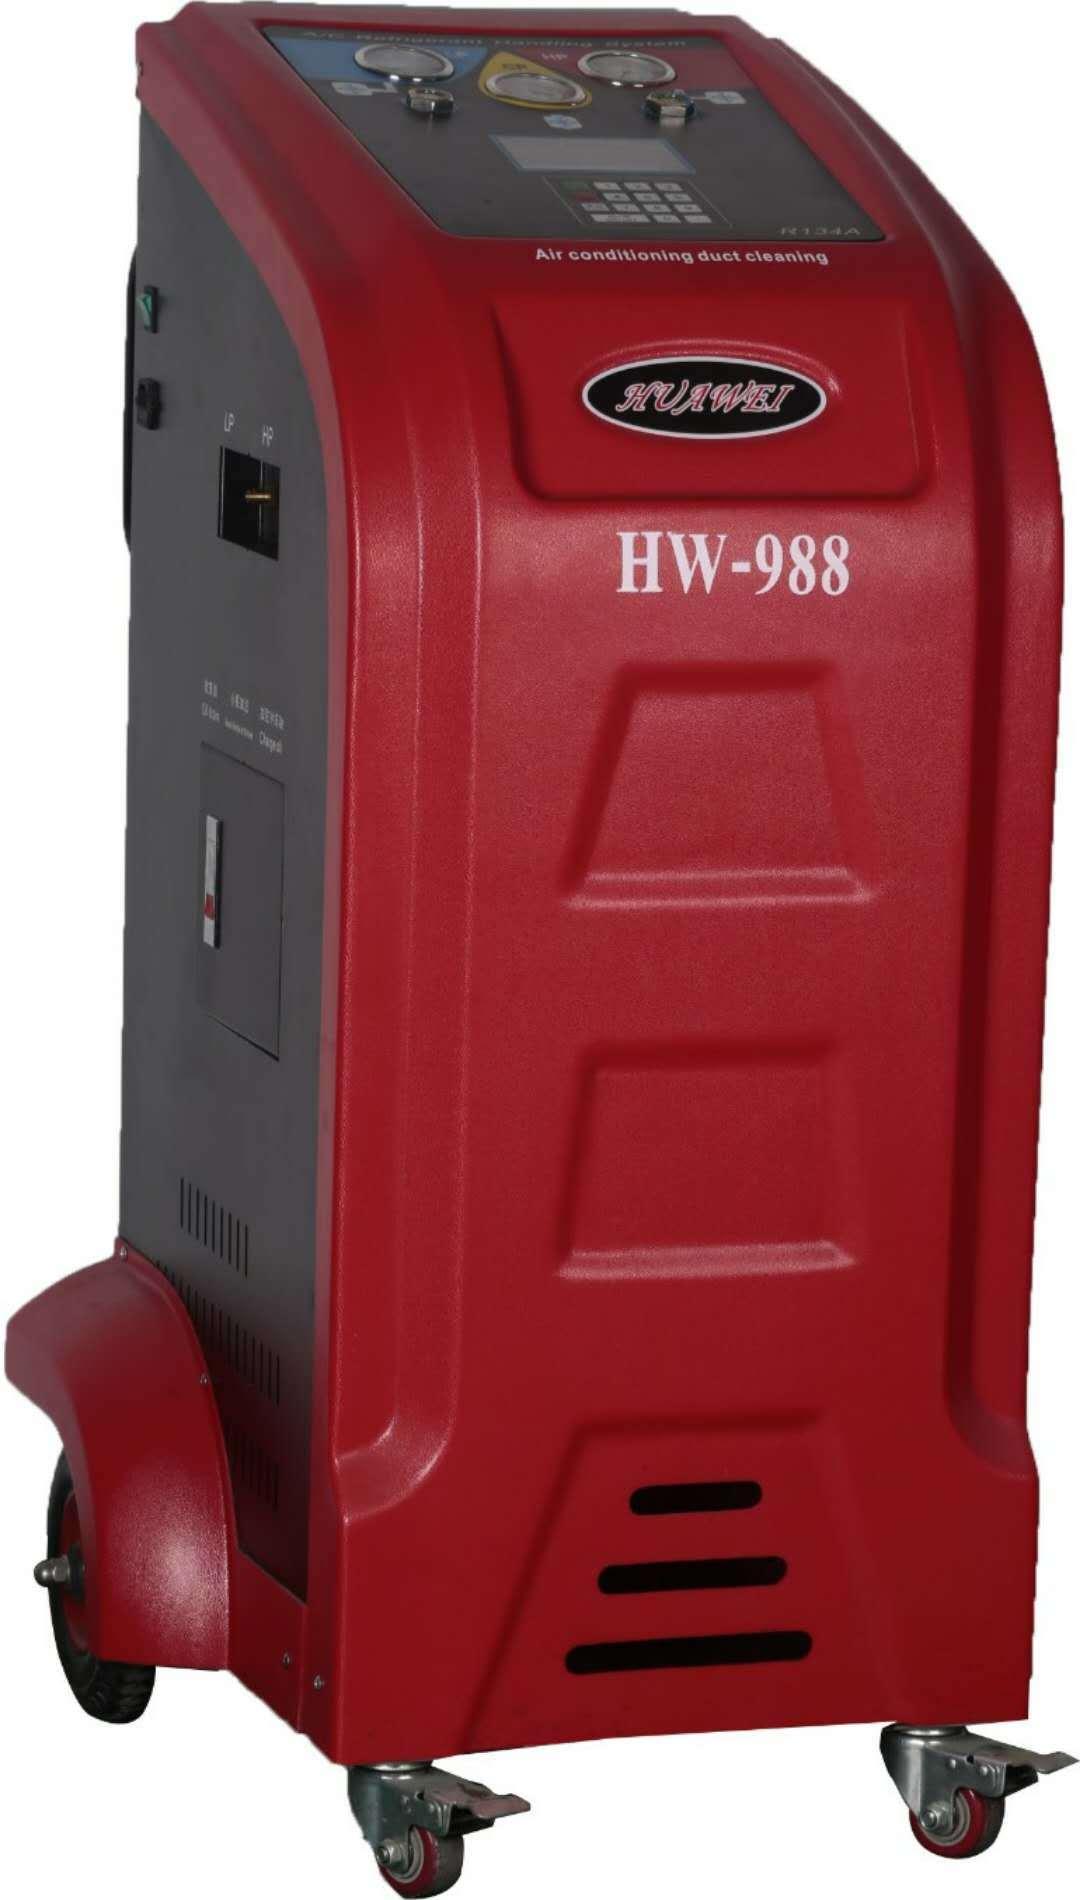 New! ! ! ! Hw-988 Car AC Refrigerant Recovery Machine Refrigerant Recovery